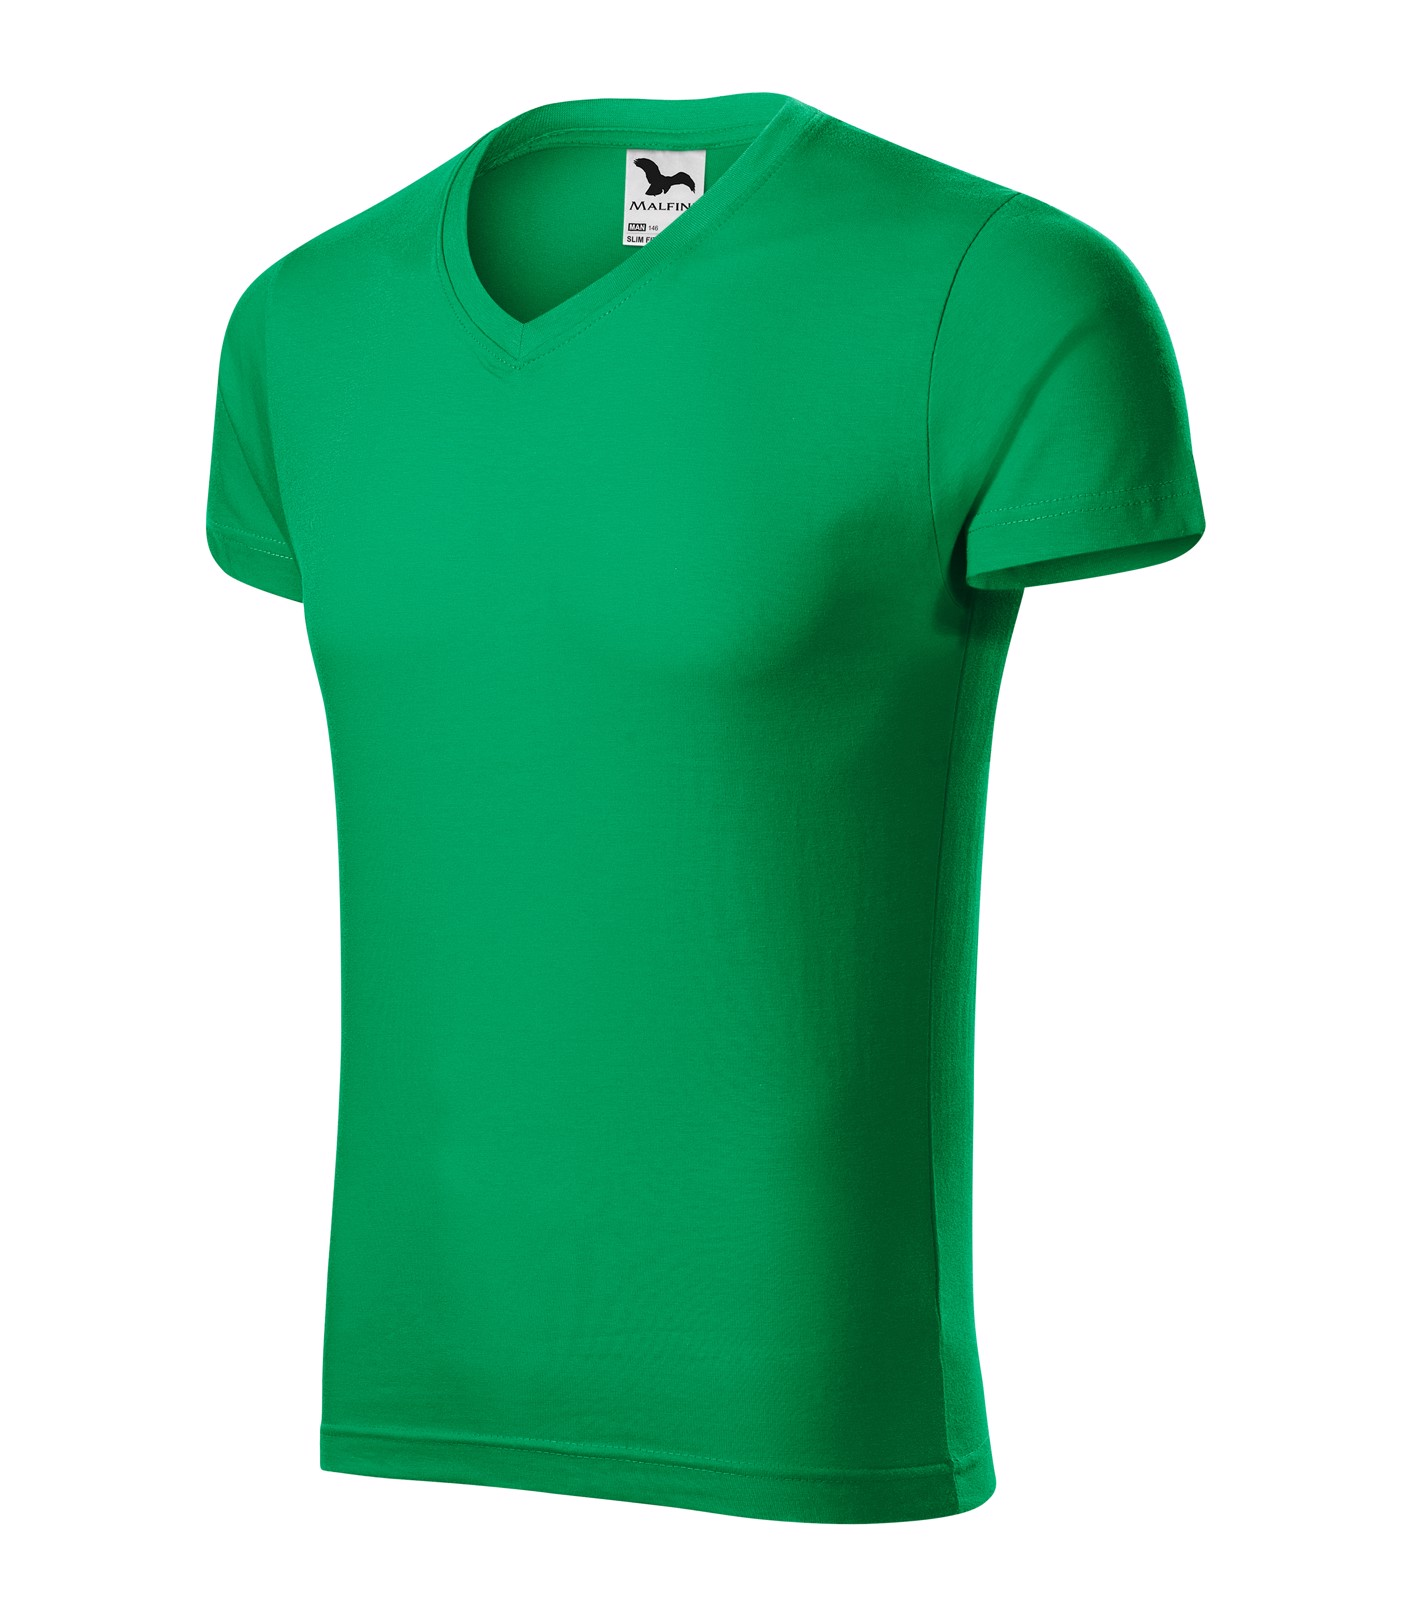 T-shirt men's Malfini Slim Fit V-neck - Kelly Green / M